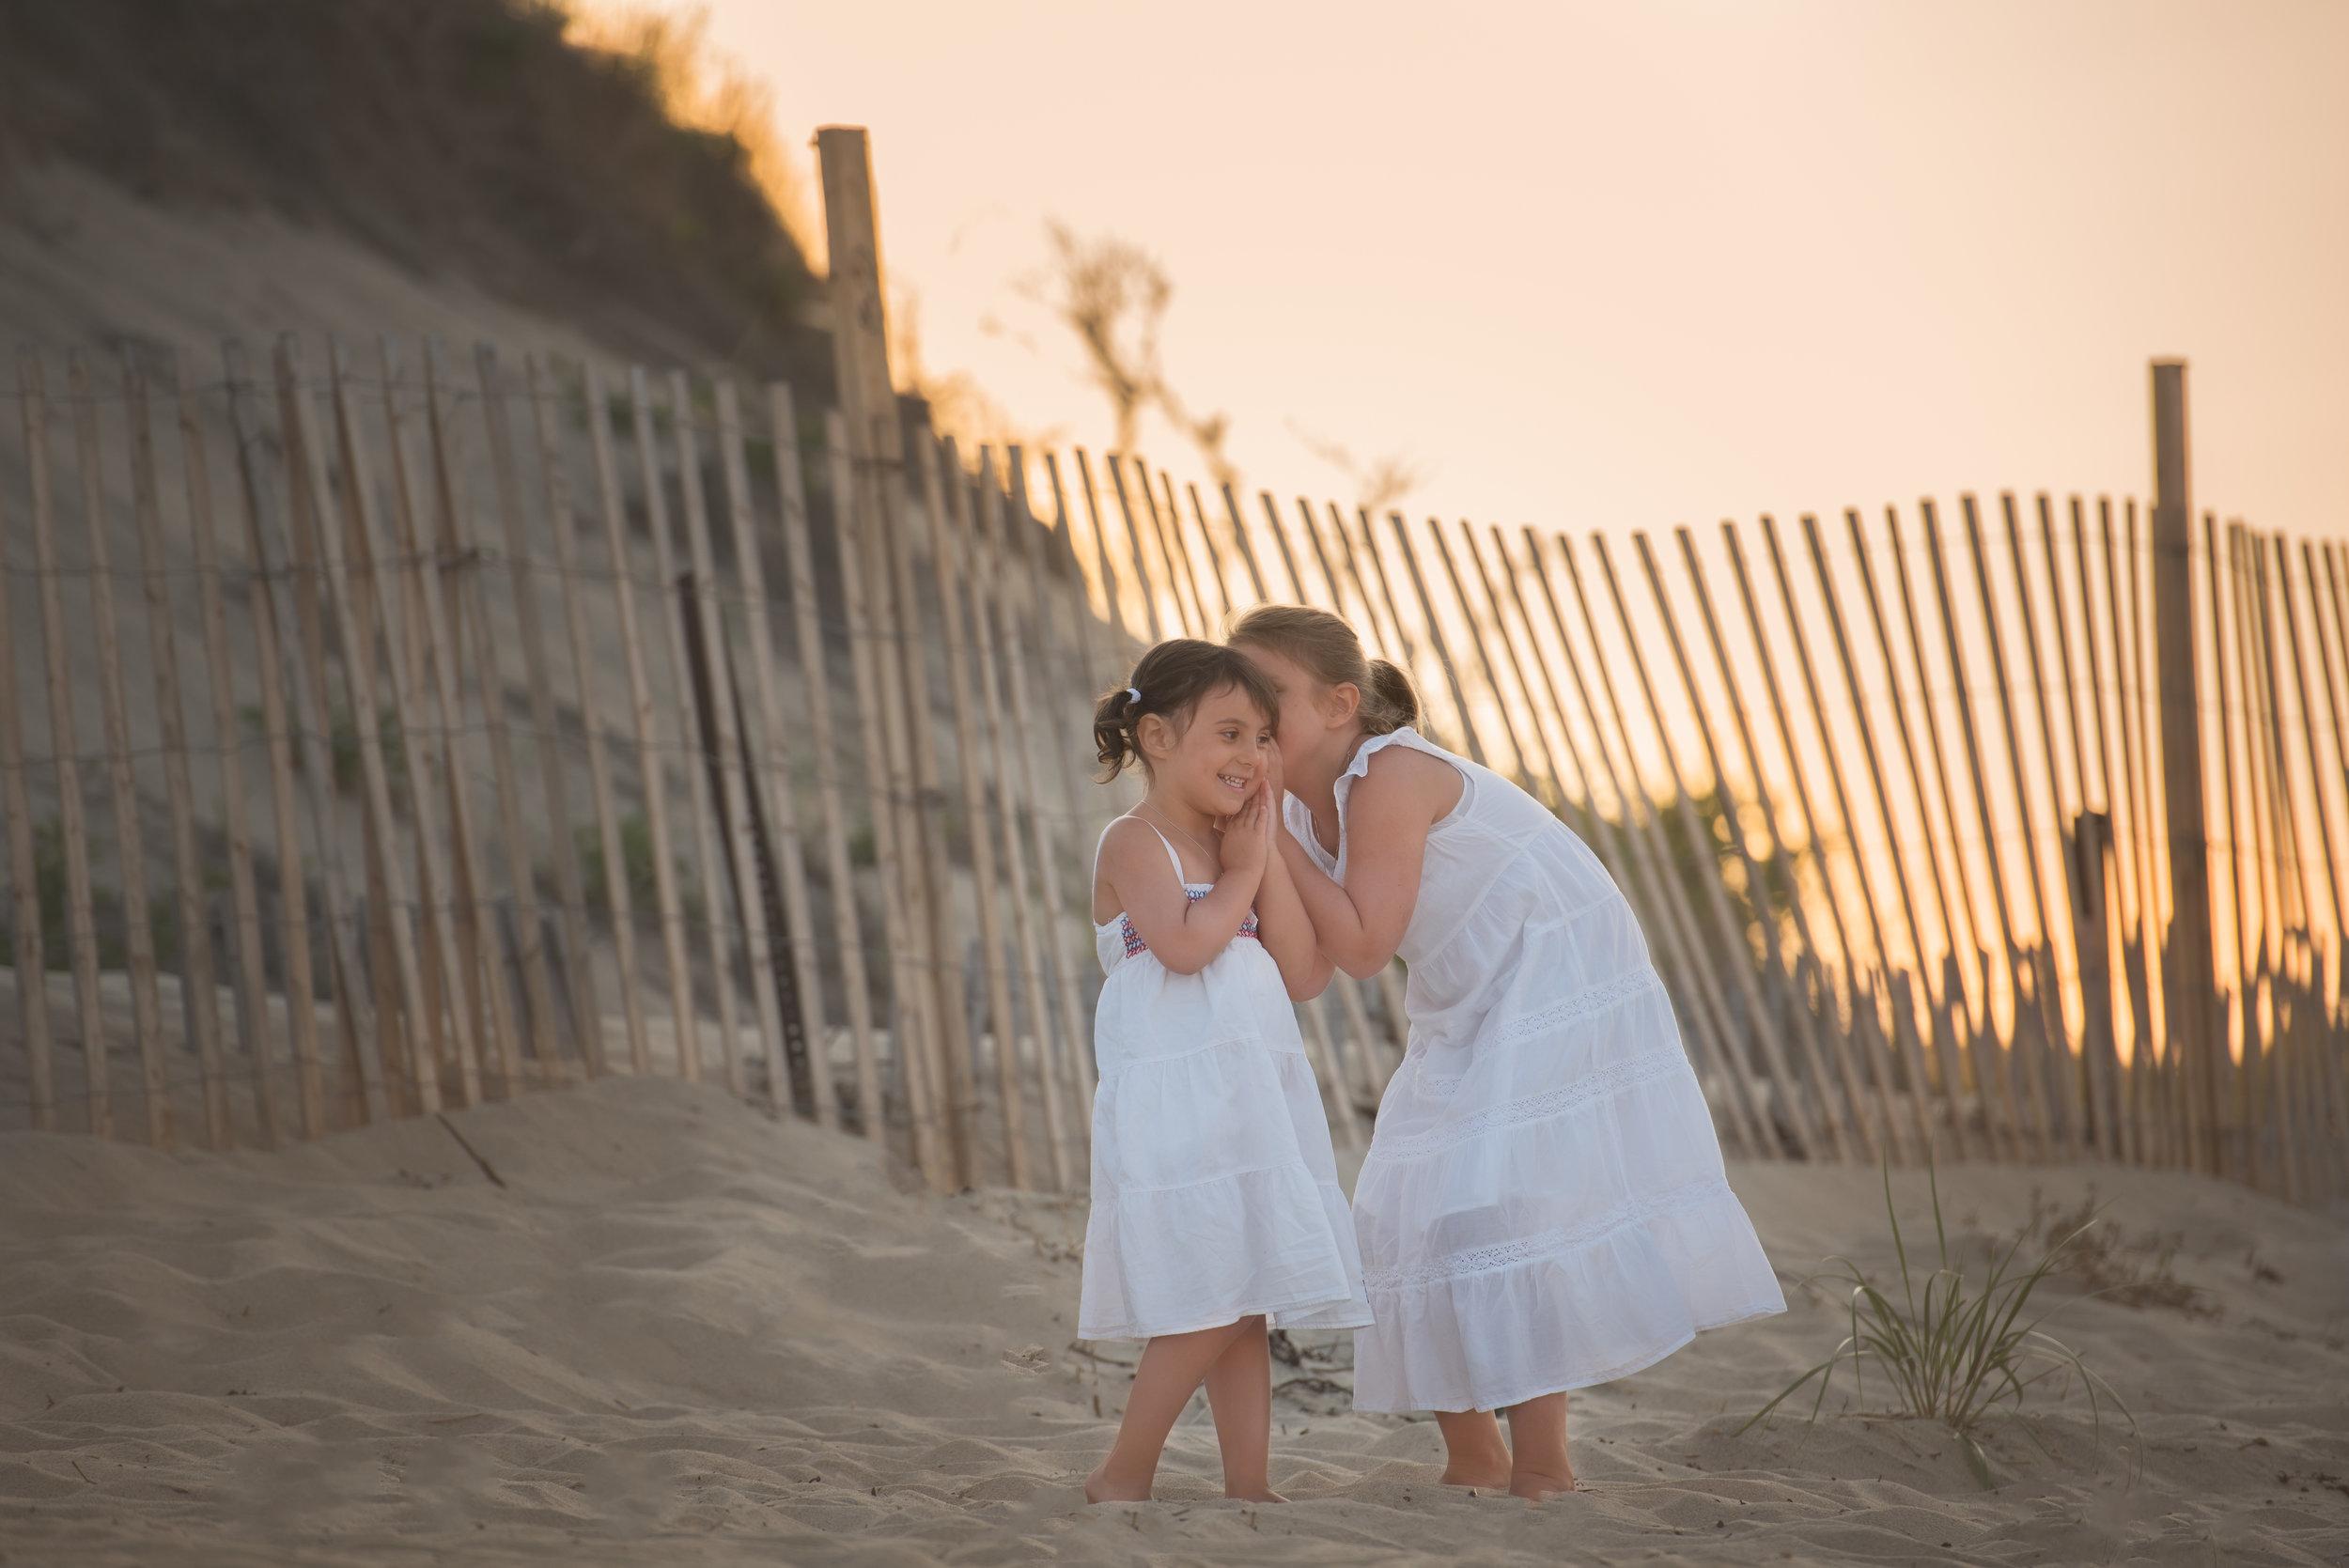 Girls Telling Secrets at Sunset Beach